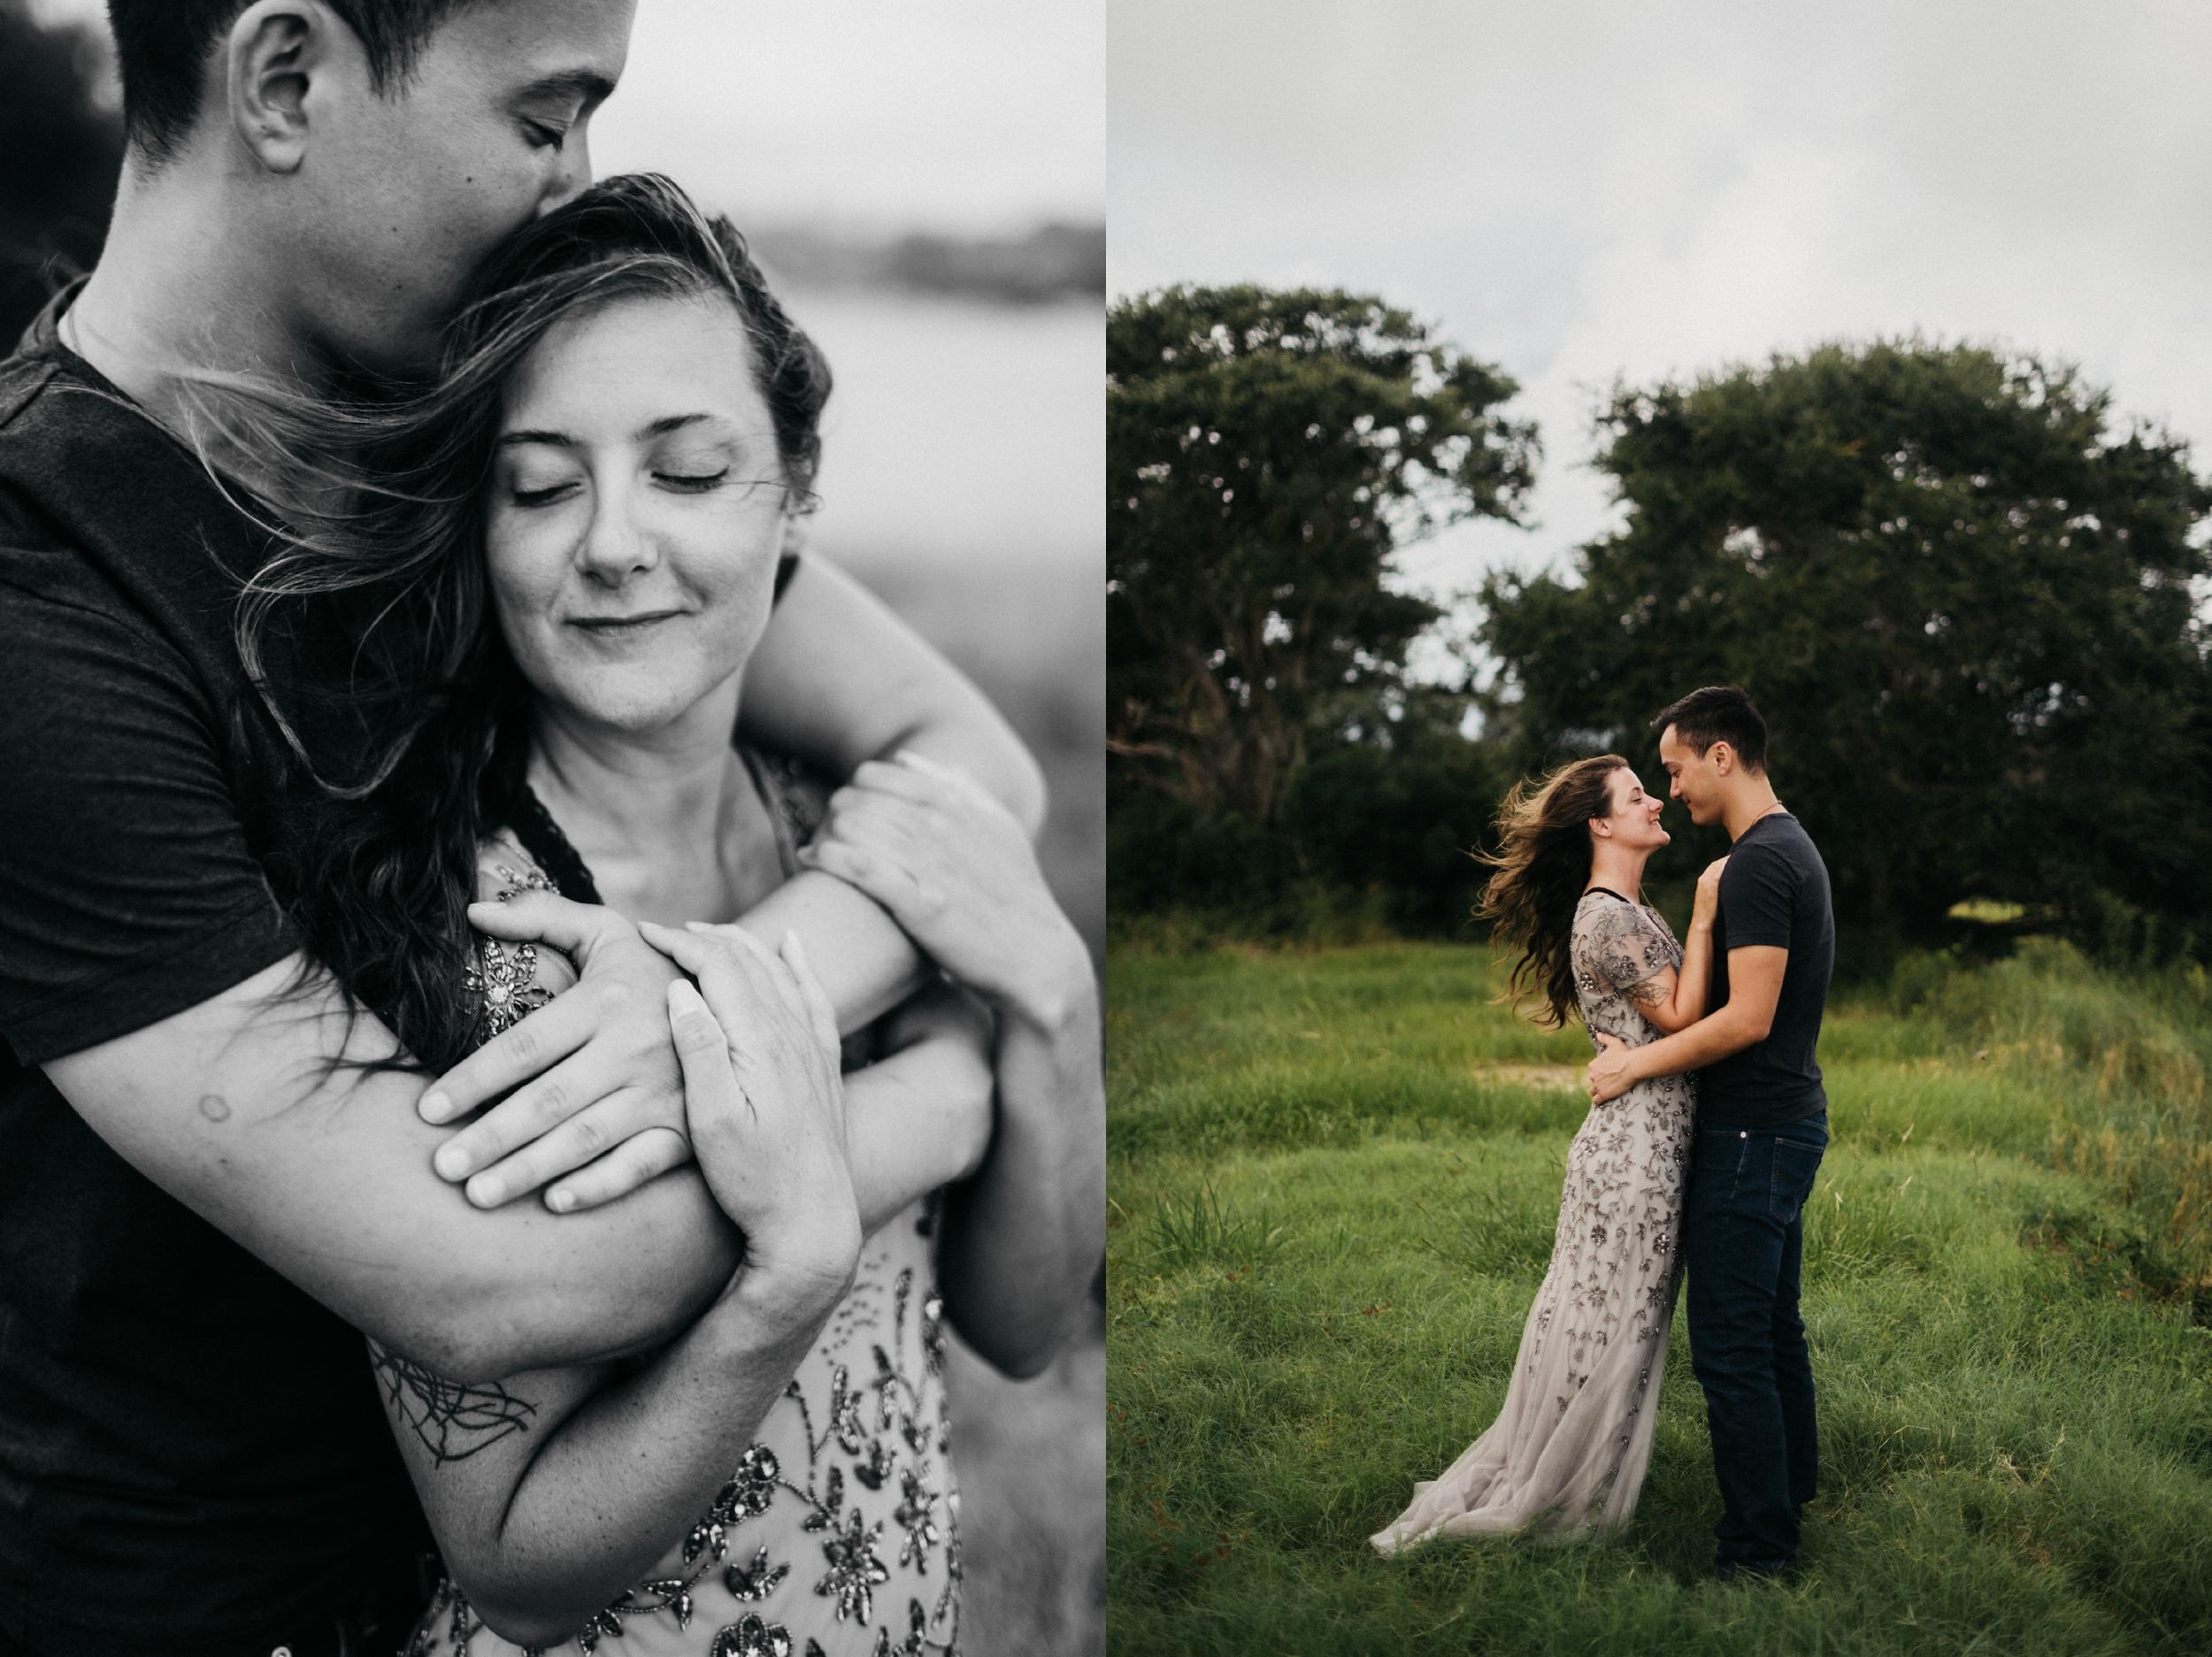 desiree-gardner-photography-pairs-france-monet-garden-monets-couple-wedding-engagement-giverny-30-a-30a-florida_0057.jpg